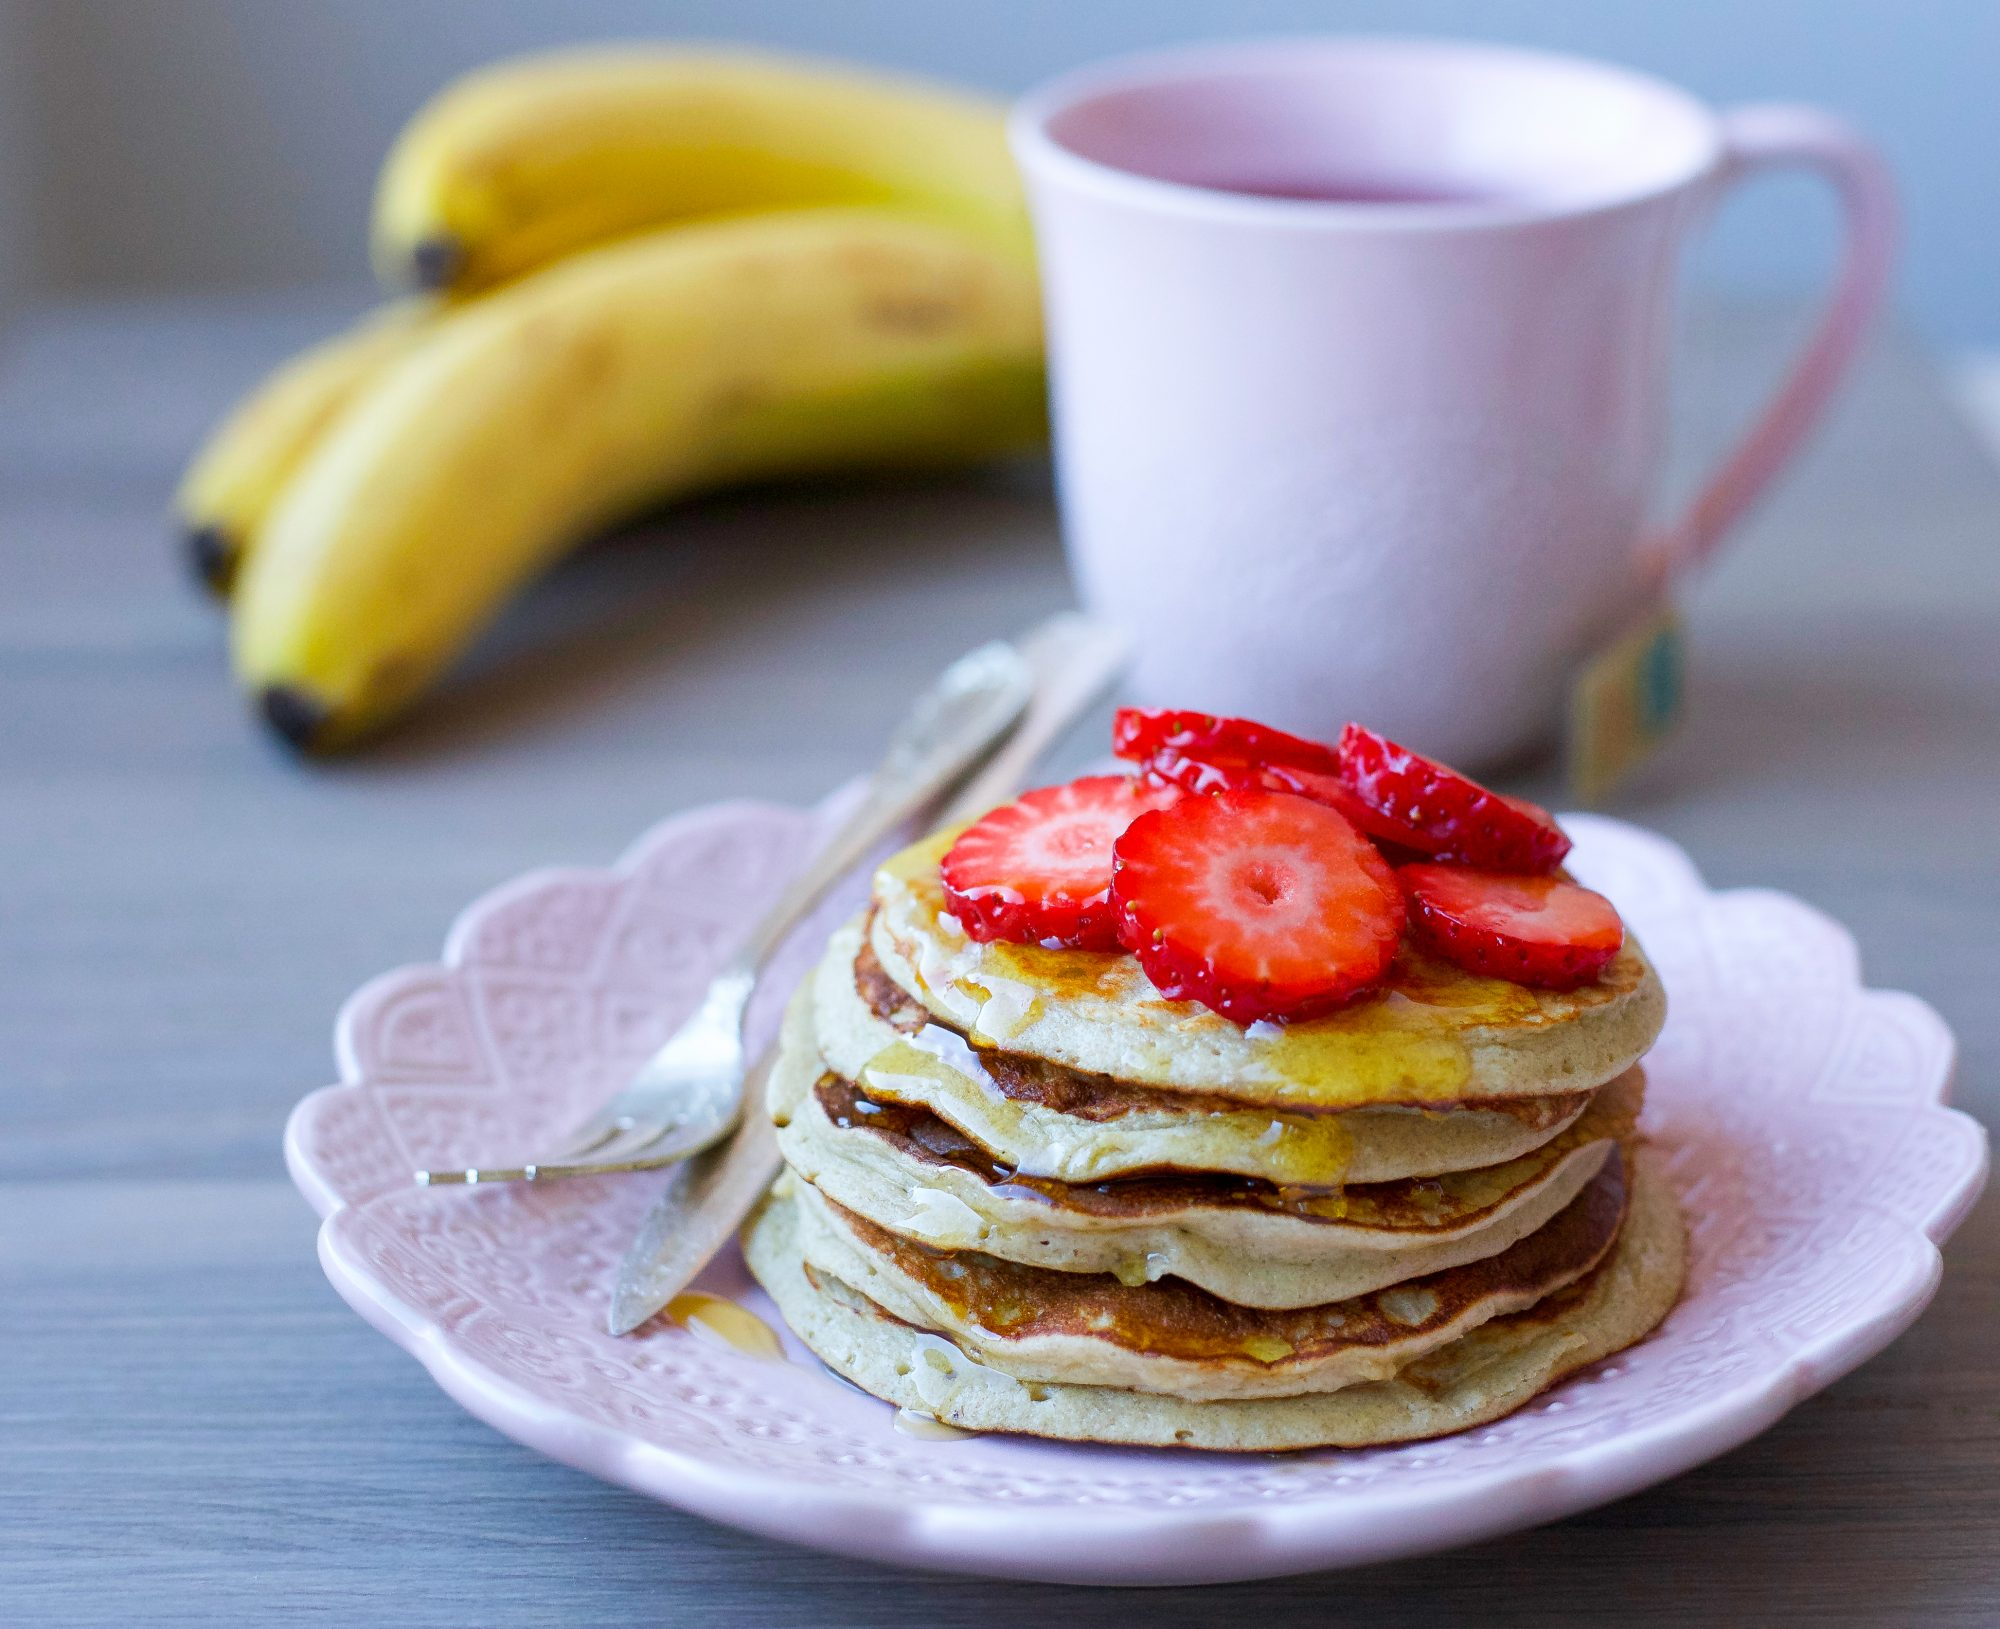 nyttiga pannkakor utan banan